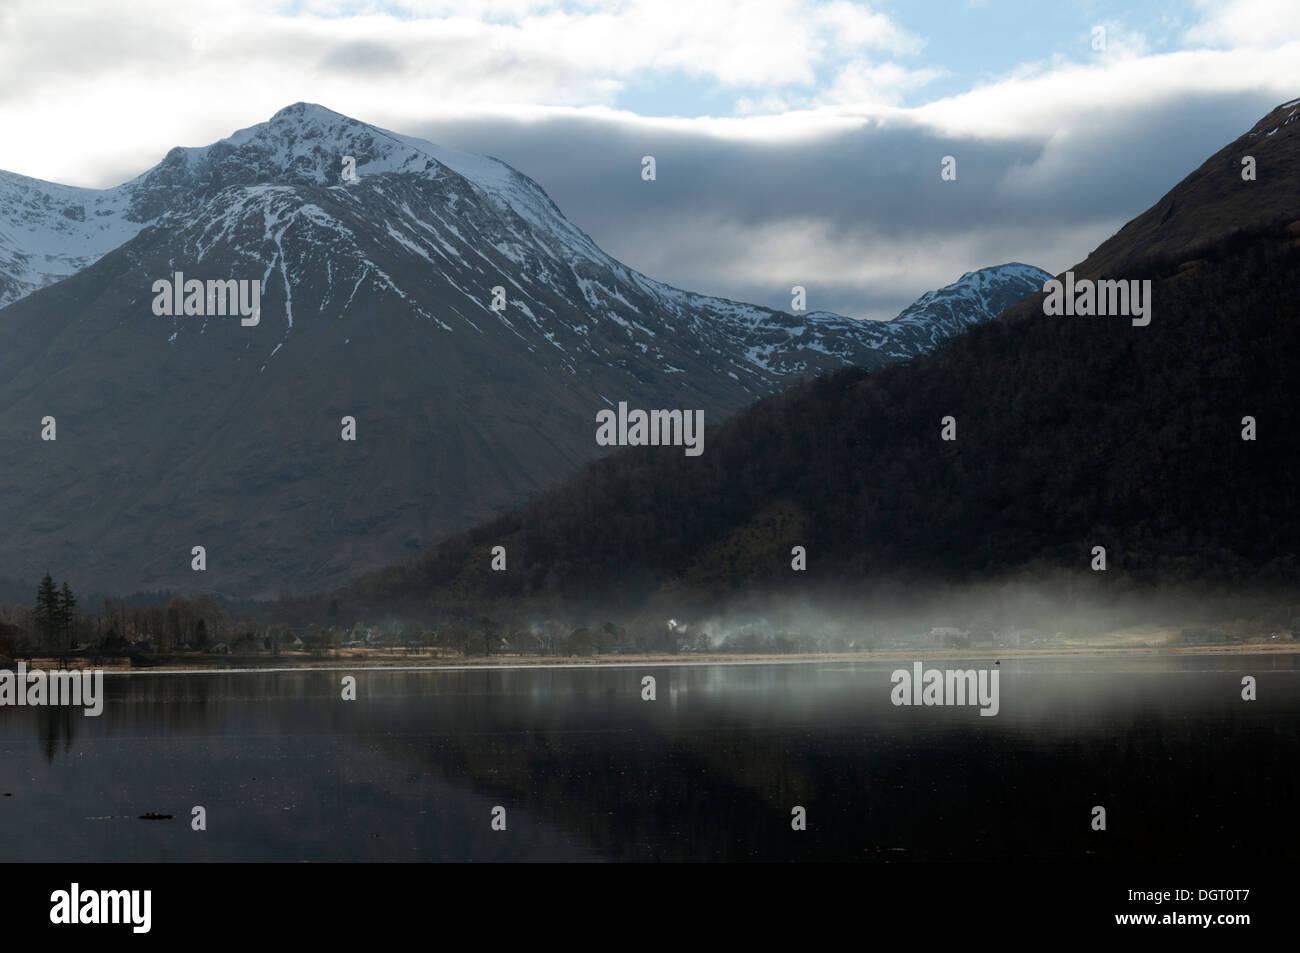 The Bidean nam Bian range, Glencoe, over Loch Leven, from near North Ballachulish, Highland region, Scotland, UK - Stock Image